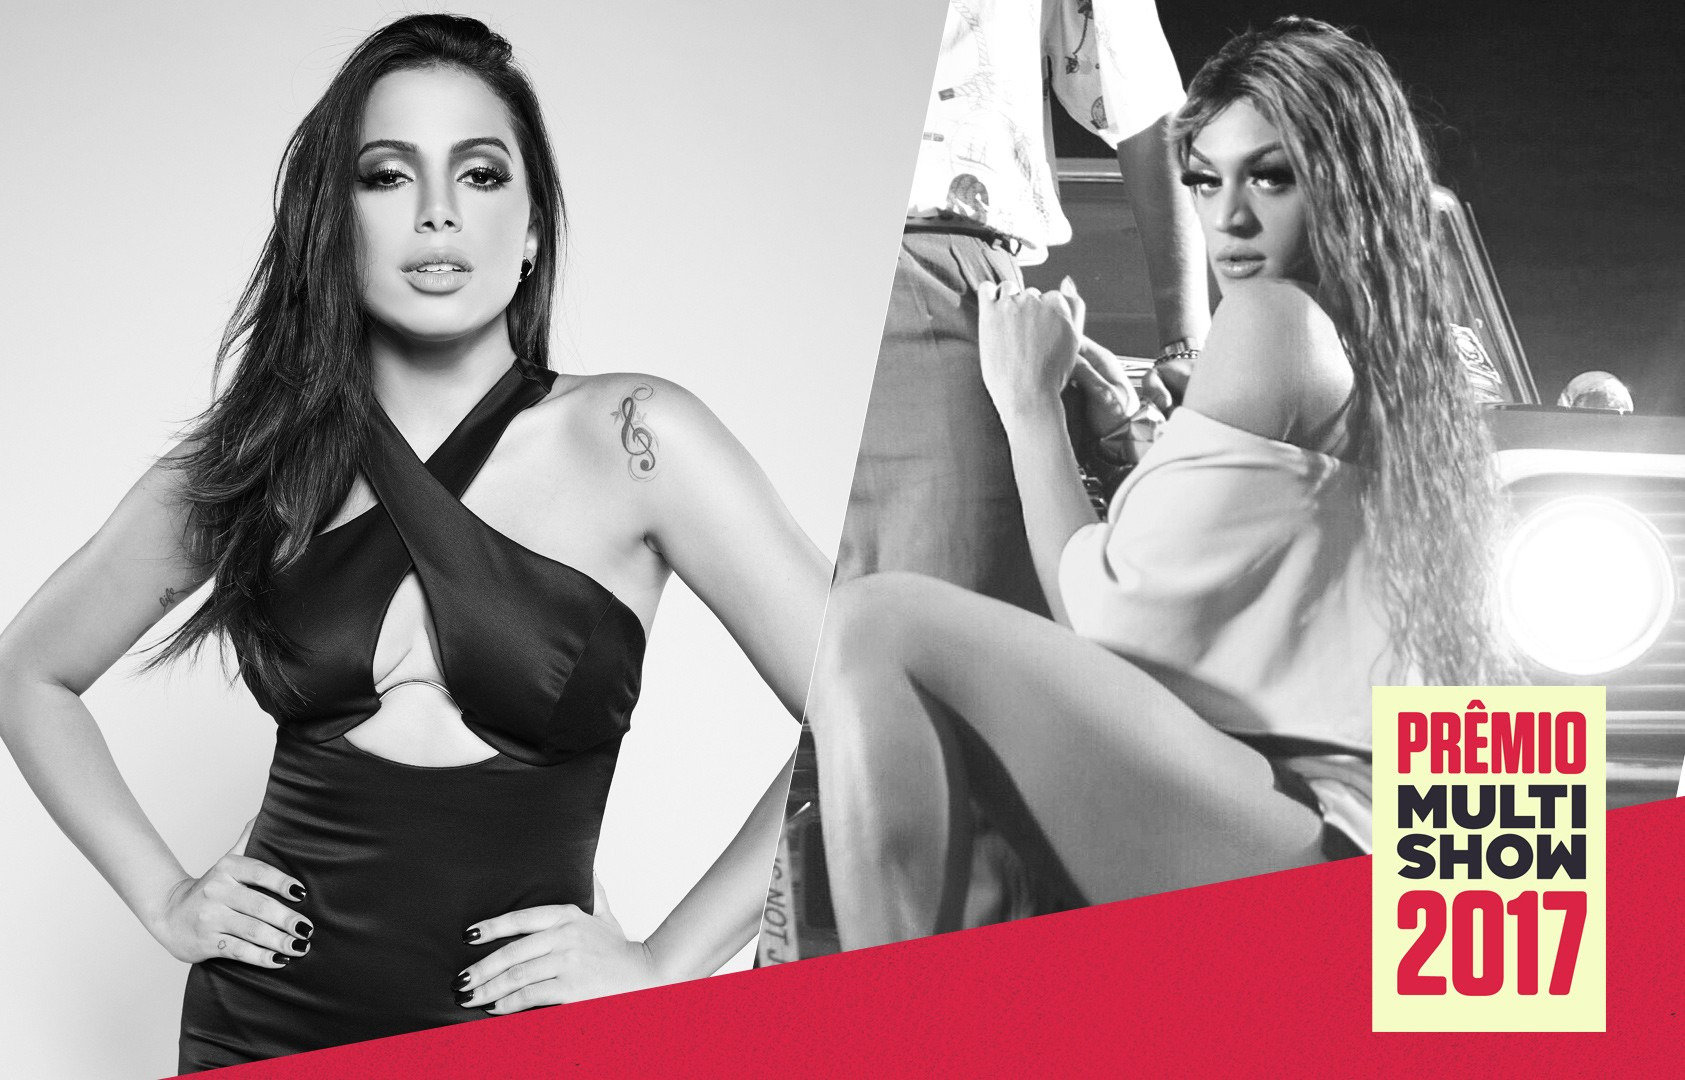 Anitta e Pabllo Vittar vo arrasar juntas no Prmio Multishow 2017 (Foto: Multishow)